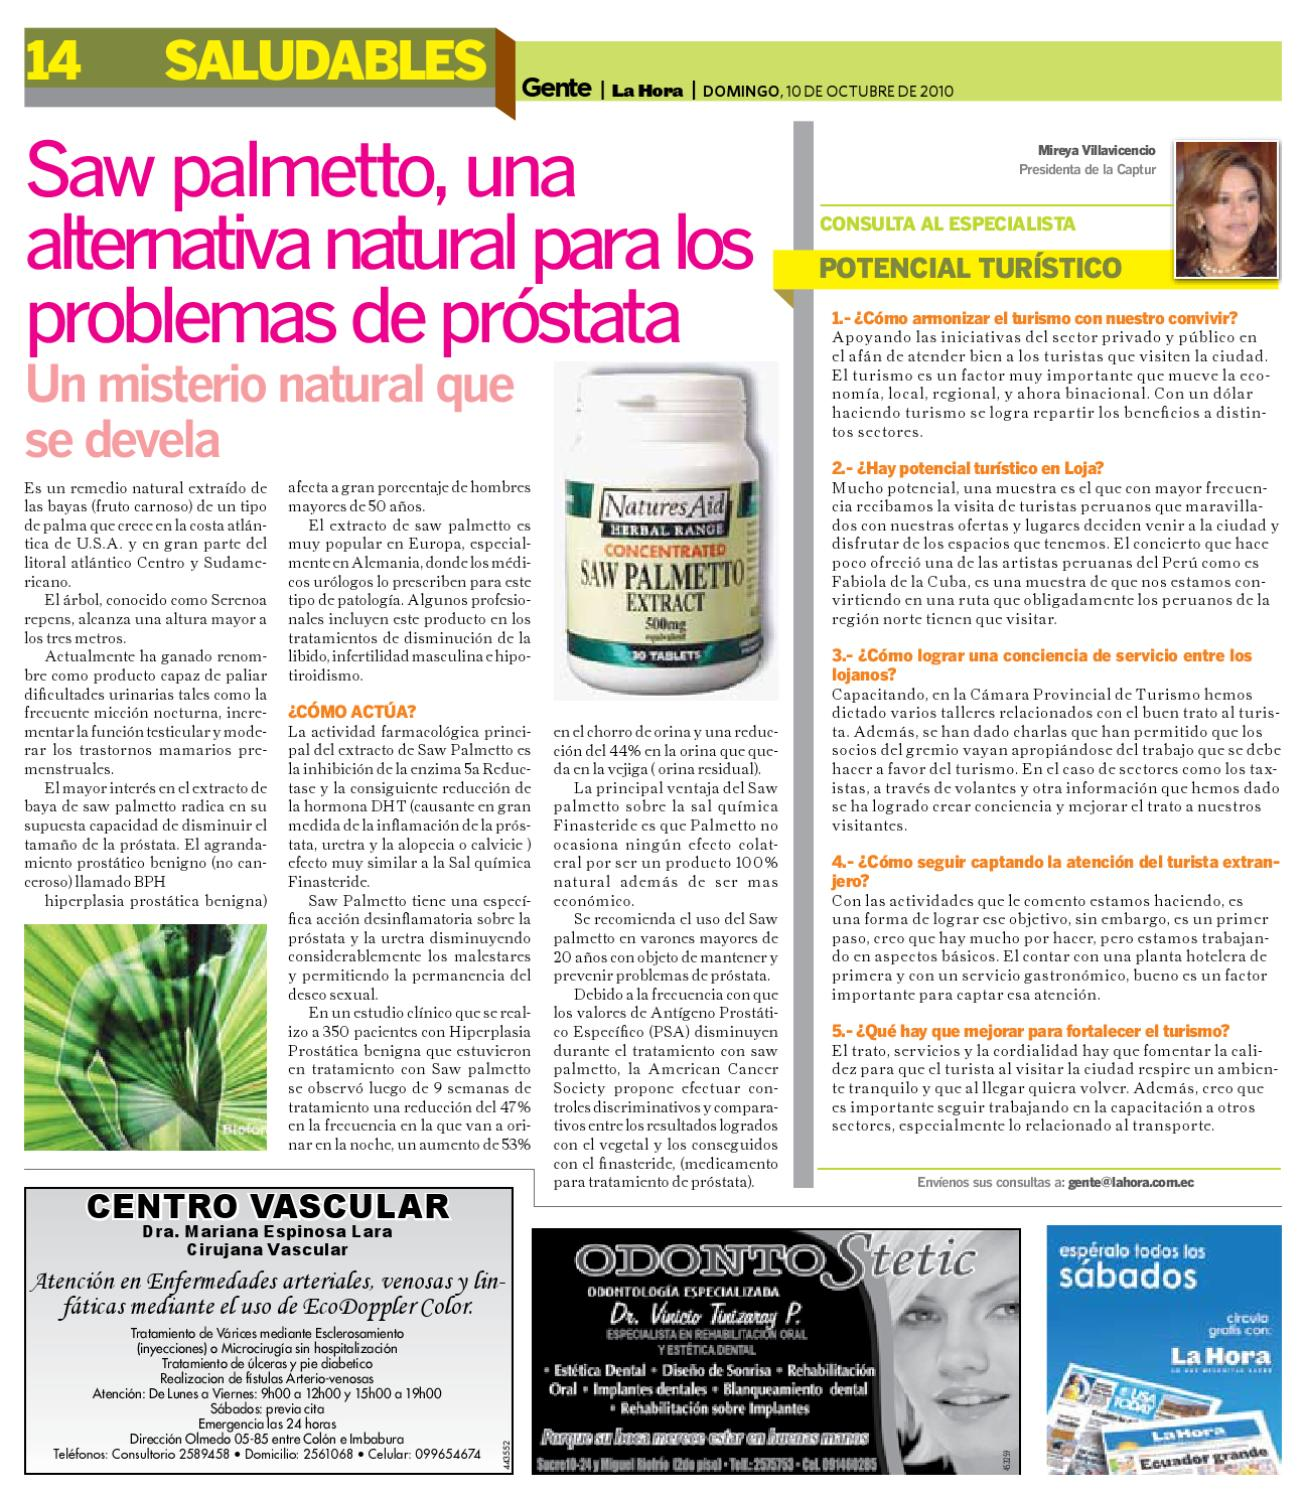 inflamación de la próstata serenoa repensar